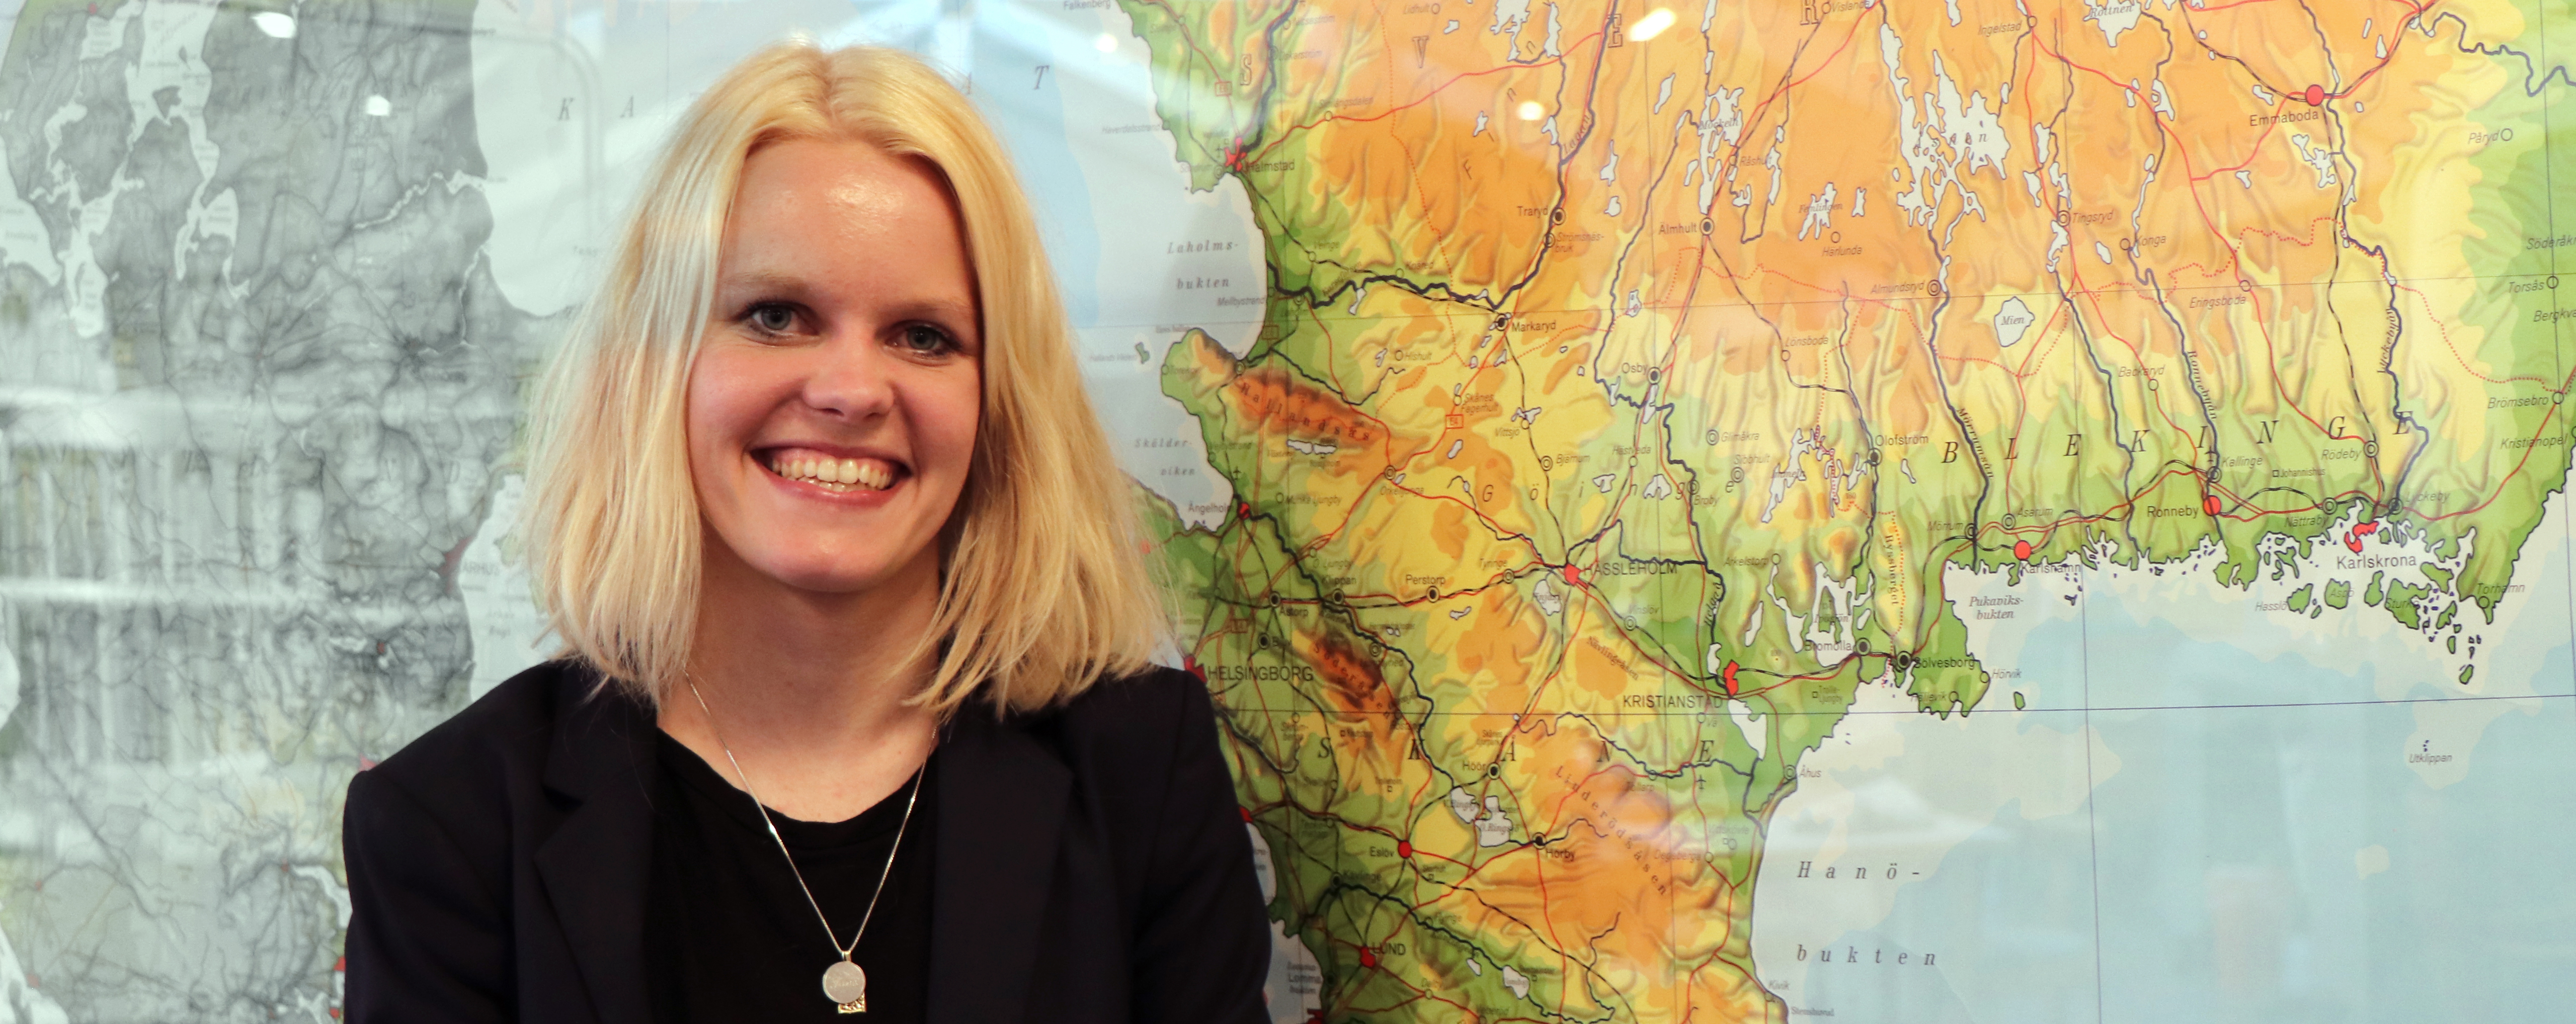 Maria Fromseier Kjærgaard